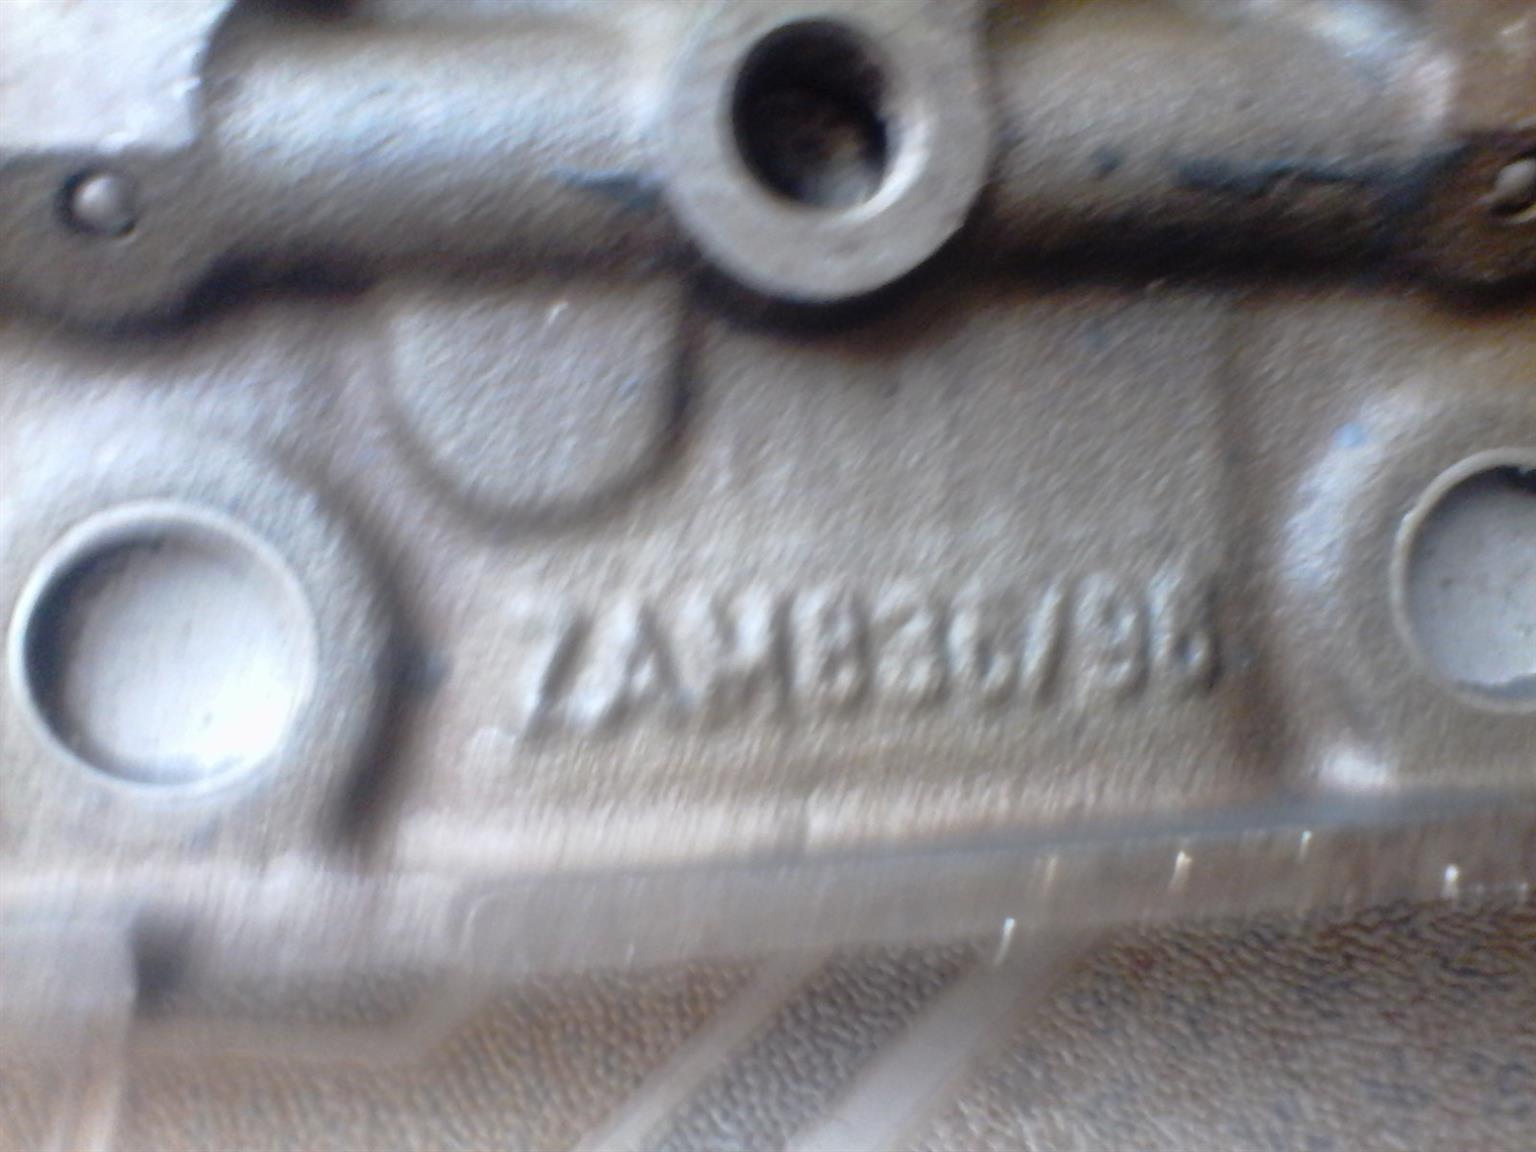 Mercedes Benz 904 Cylinder Head